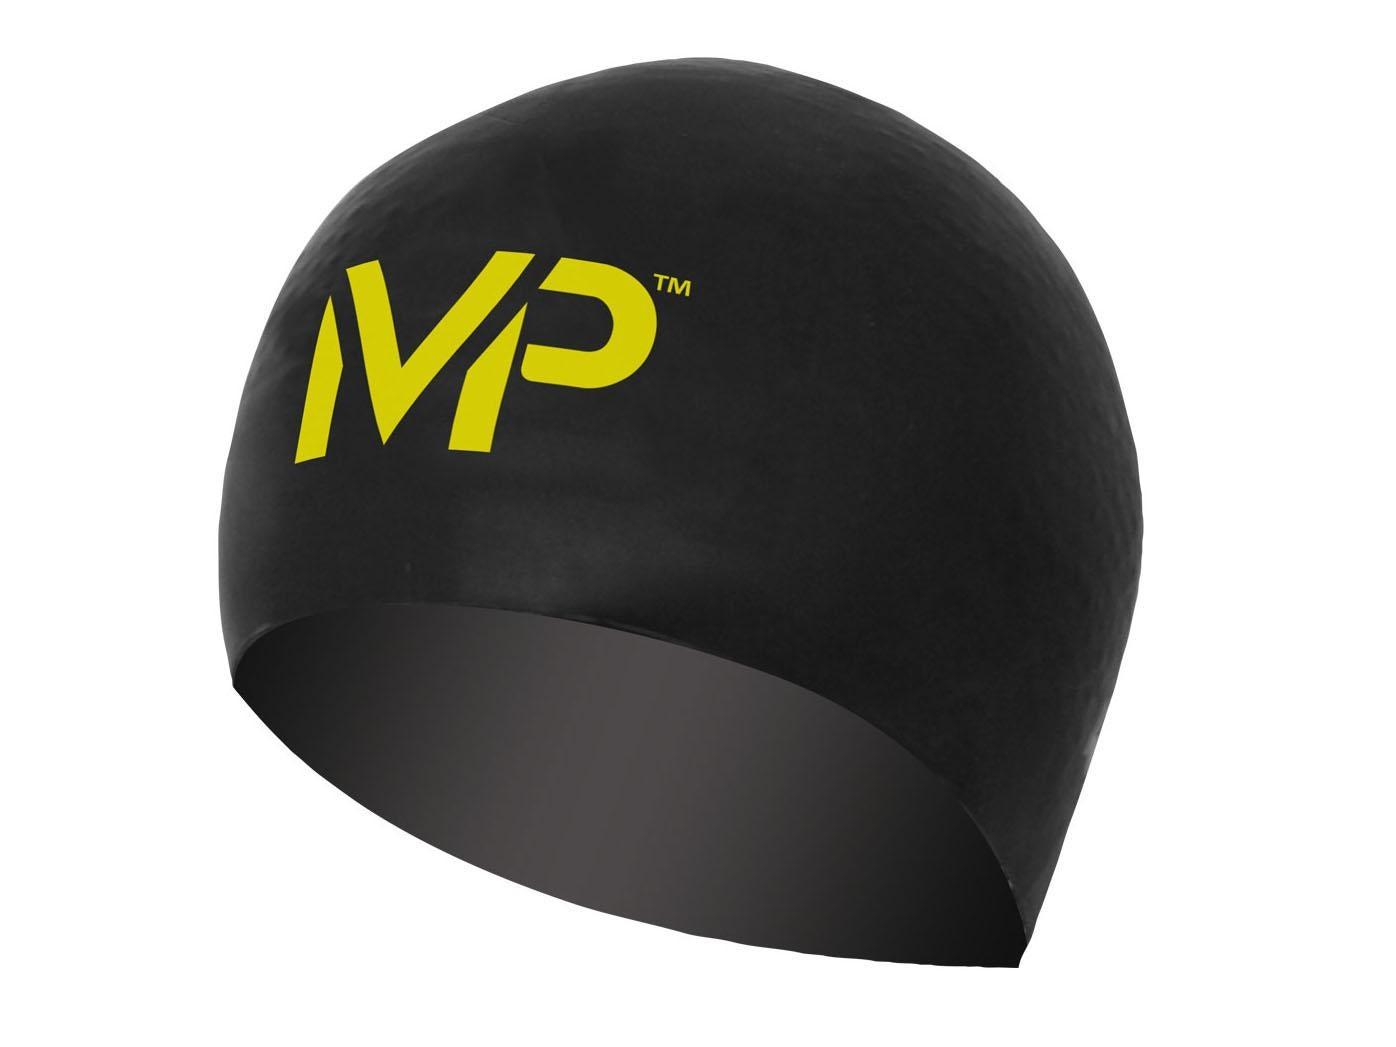 fd552b231cd Michael Phelps Race Cap  £8.99